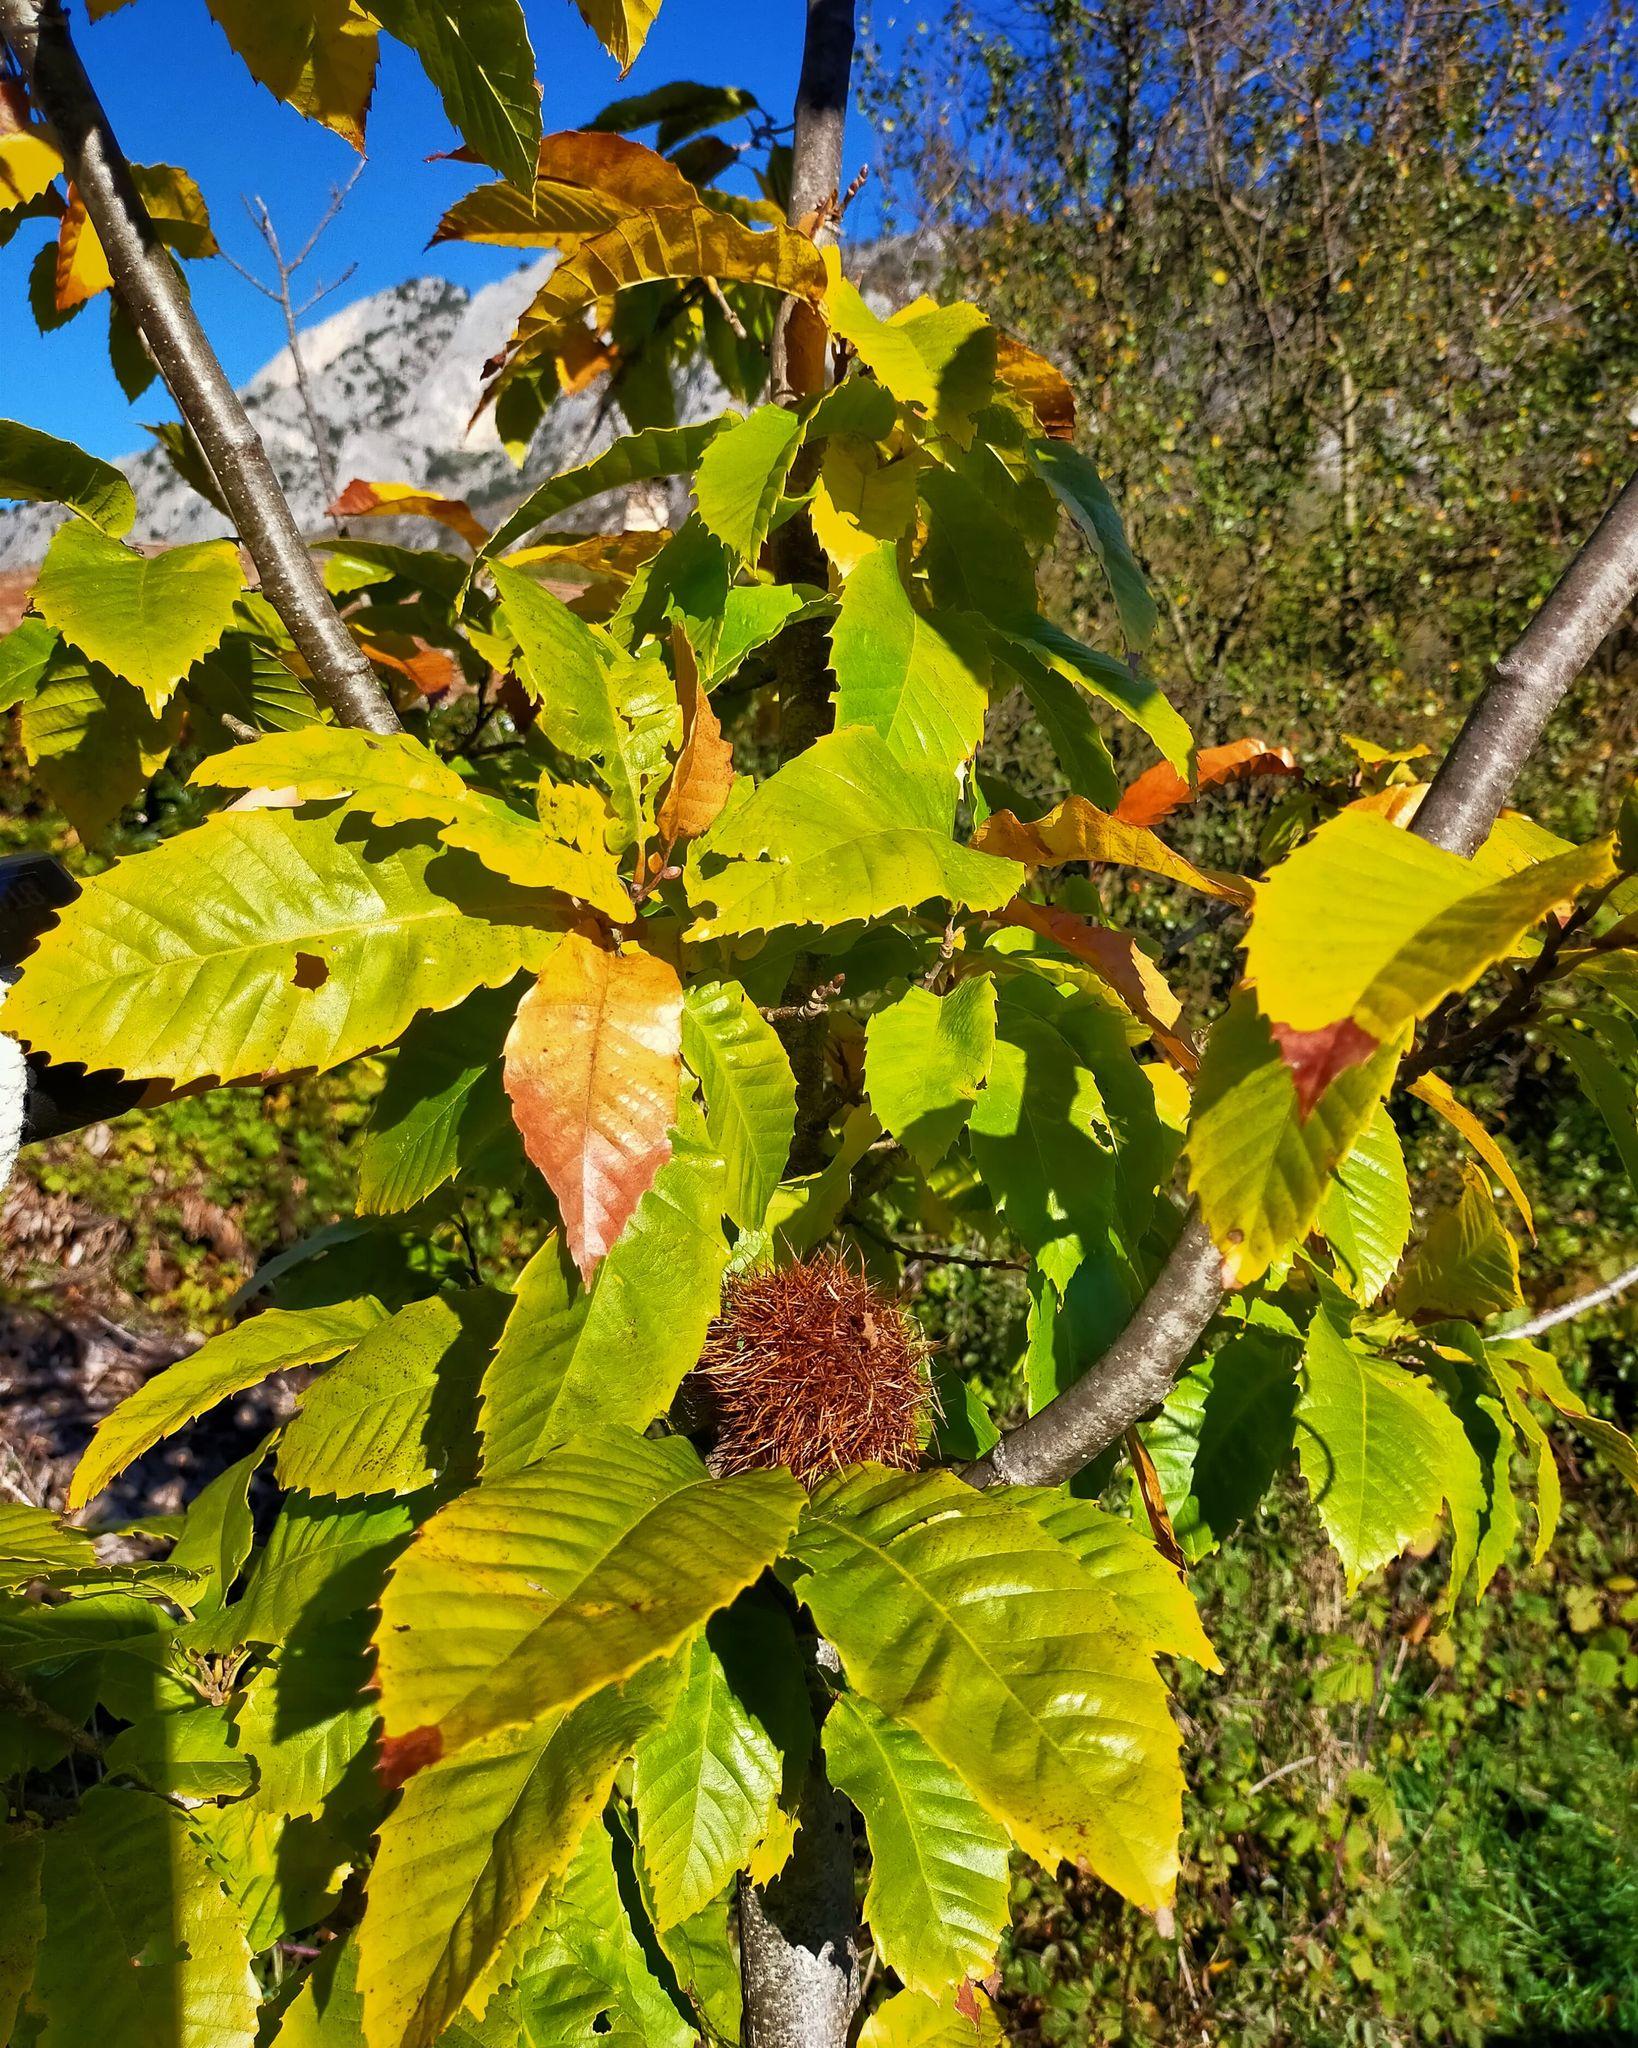 GC- Chataignier - castanea sativa - florac surba - automne 2020 - feuillage auomnal